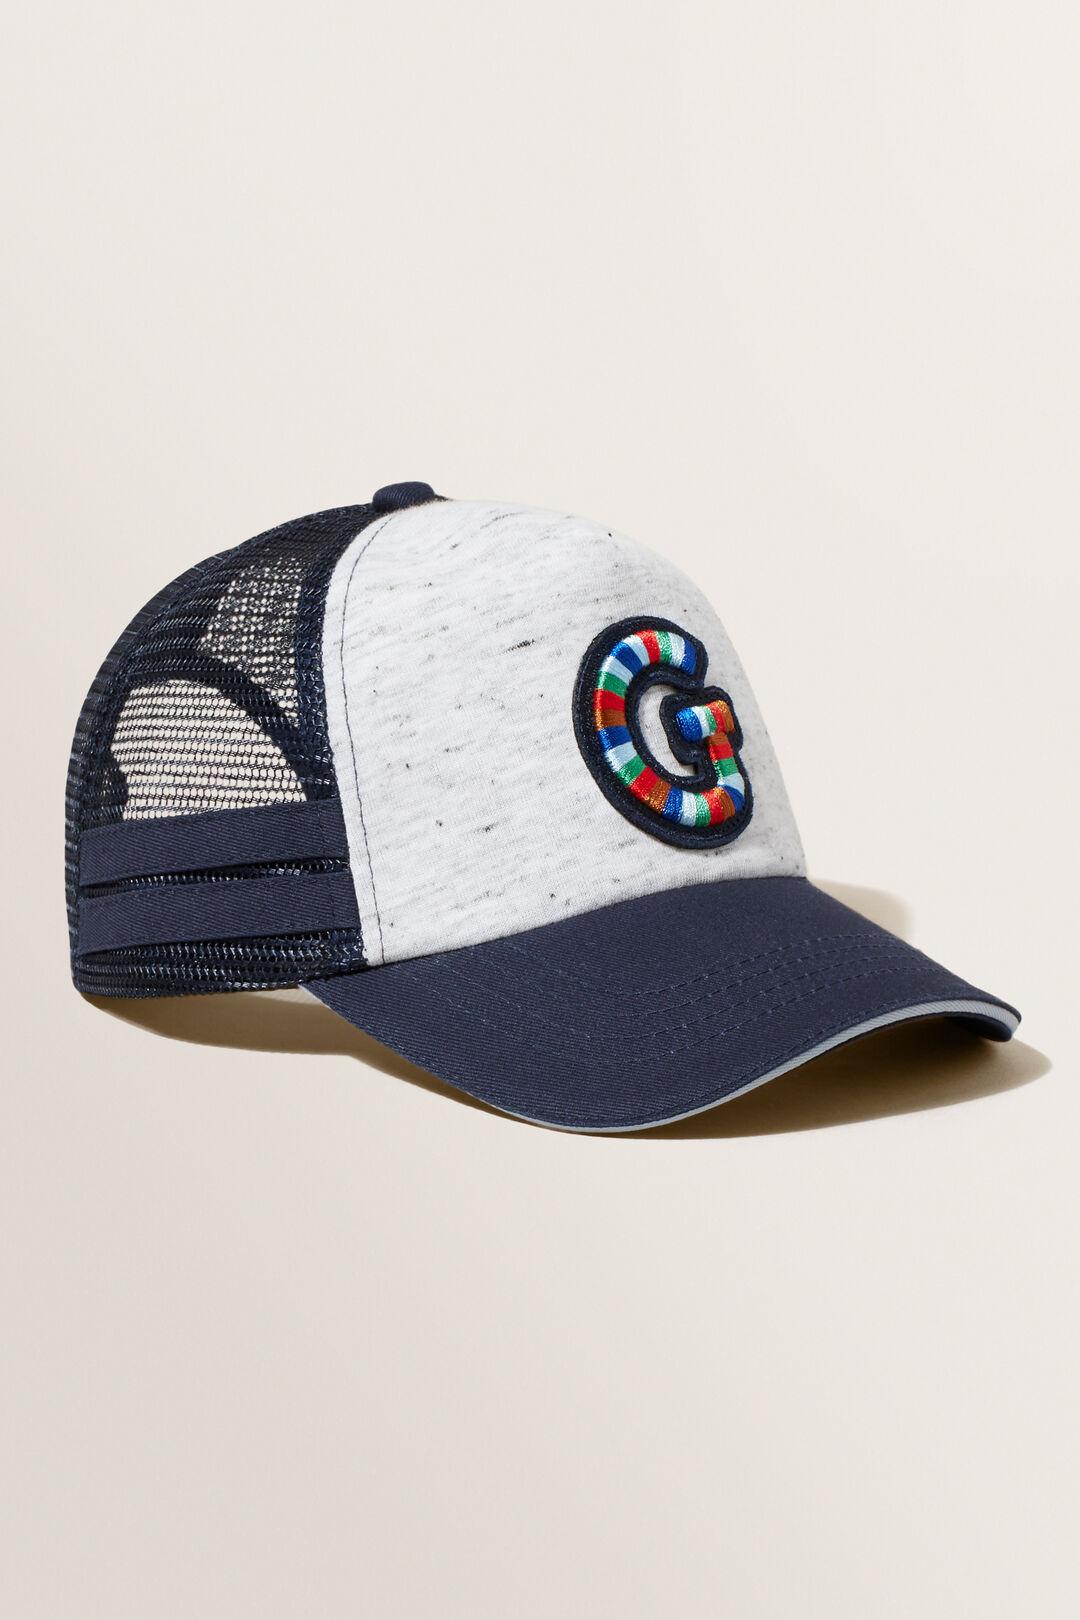 Embroidered Initial Cap  G  hi-res